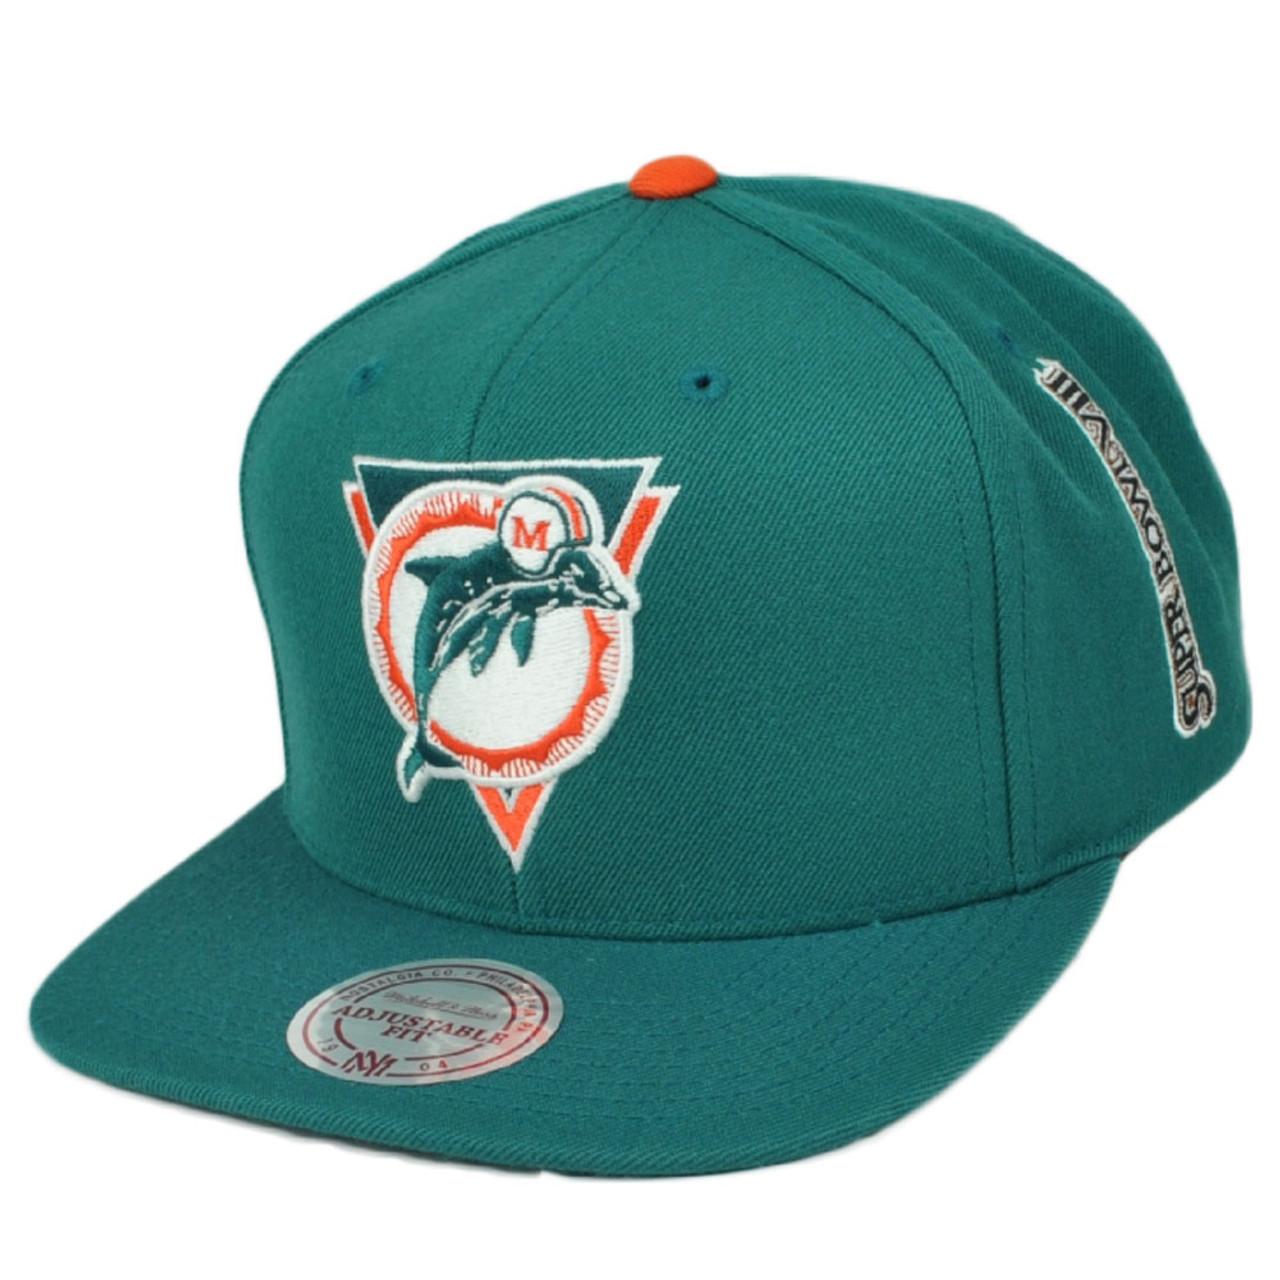 huge discount 60398 4a201 NFL Mitchell & Ness Miami Dolphins 749VZ Super Bowl VIII Snapback Flat Bill  Hat